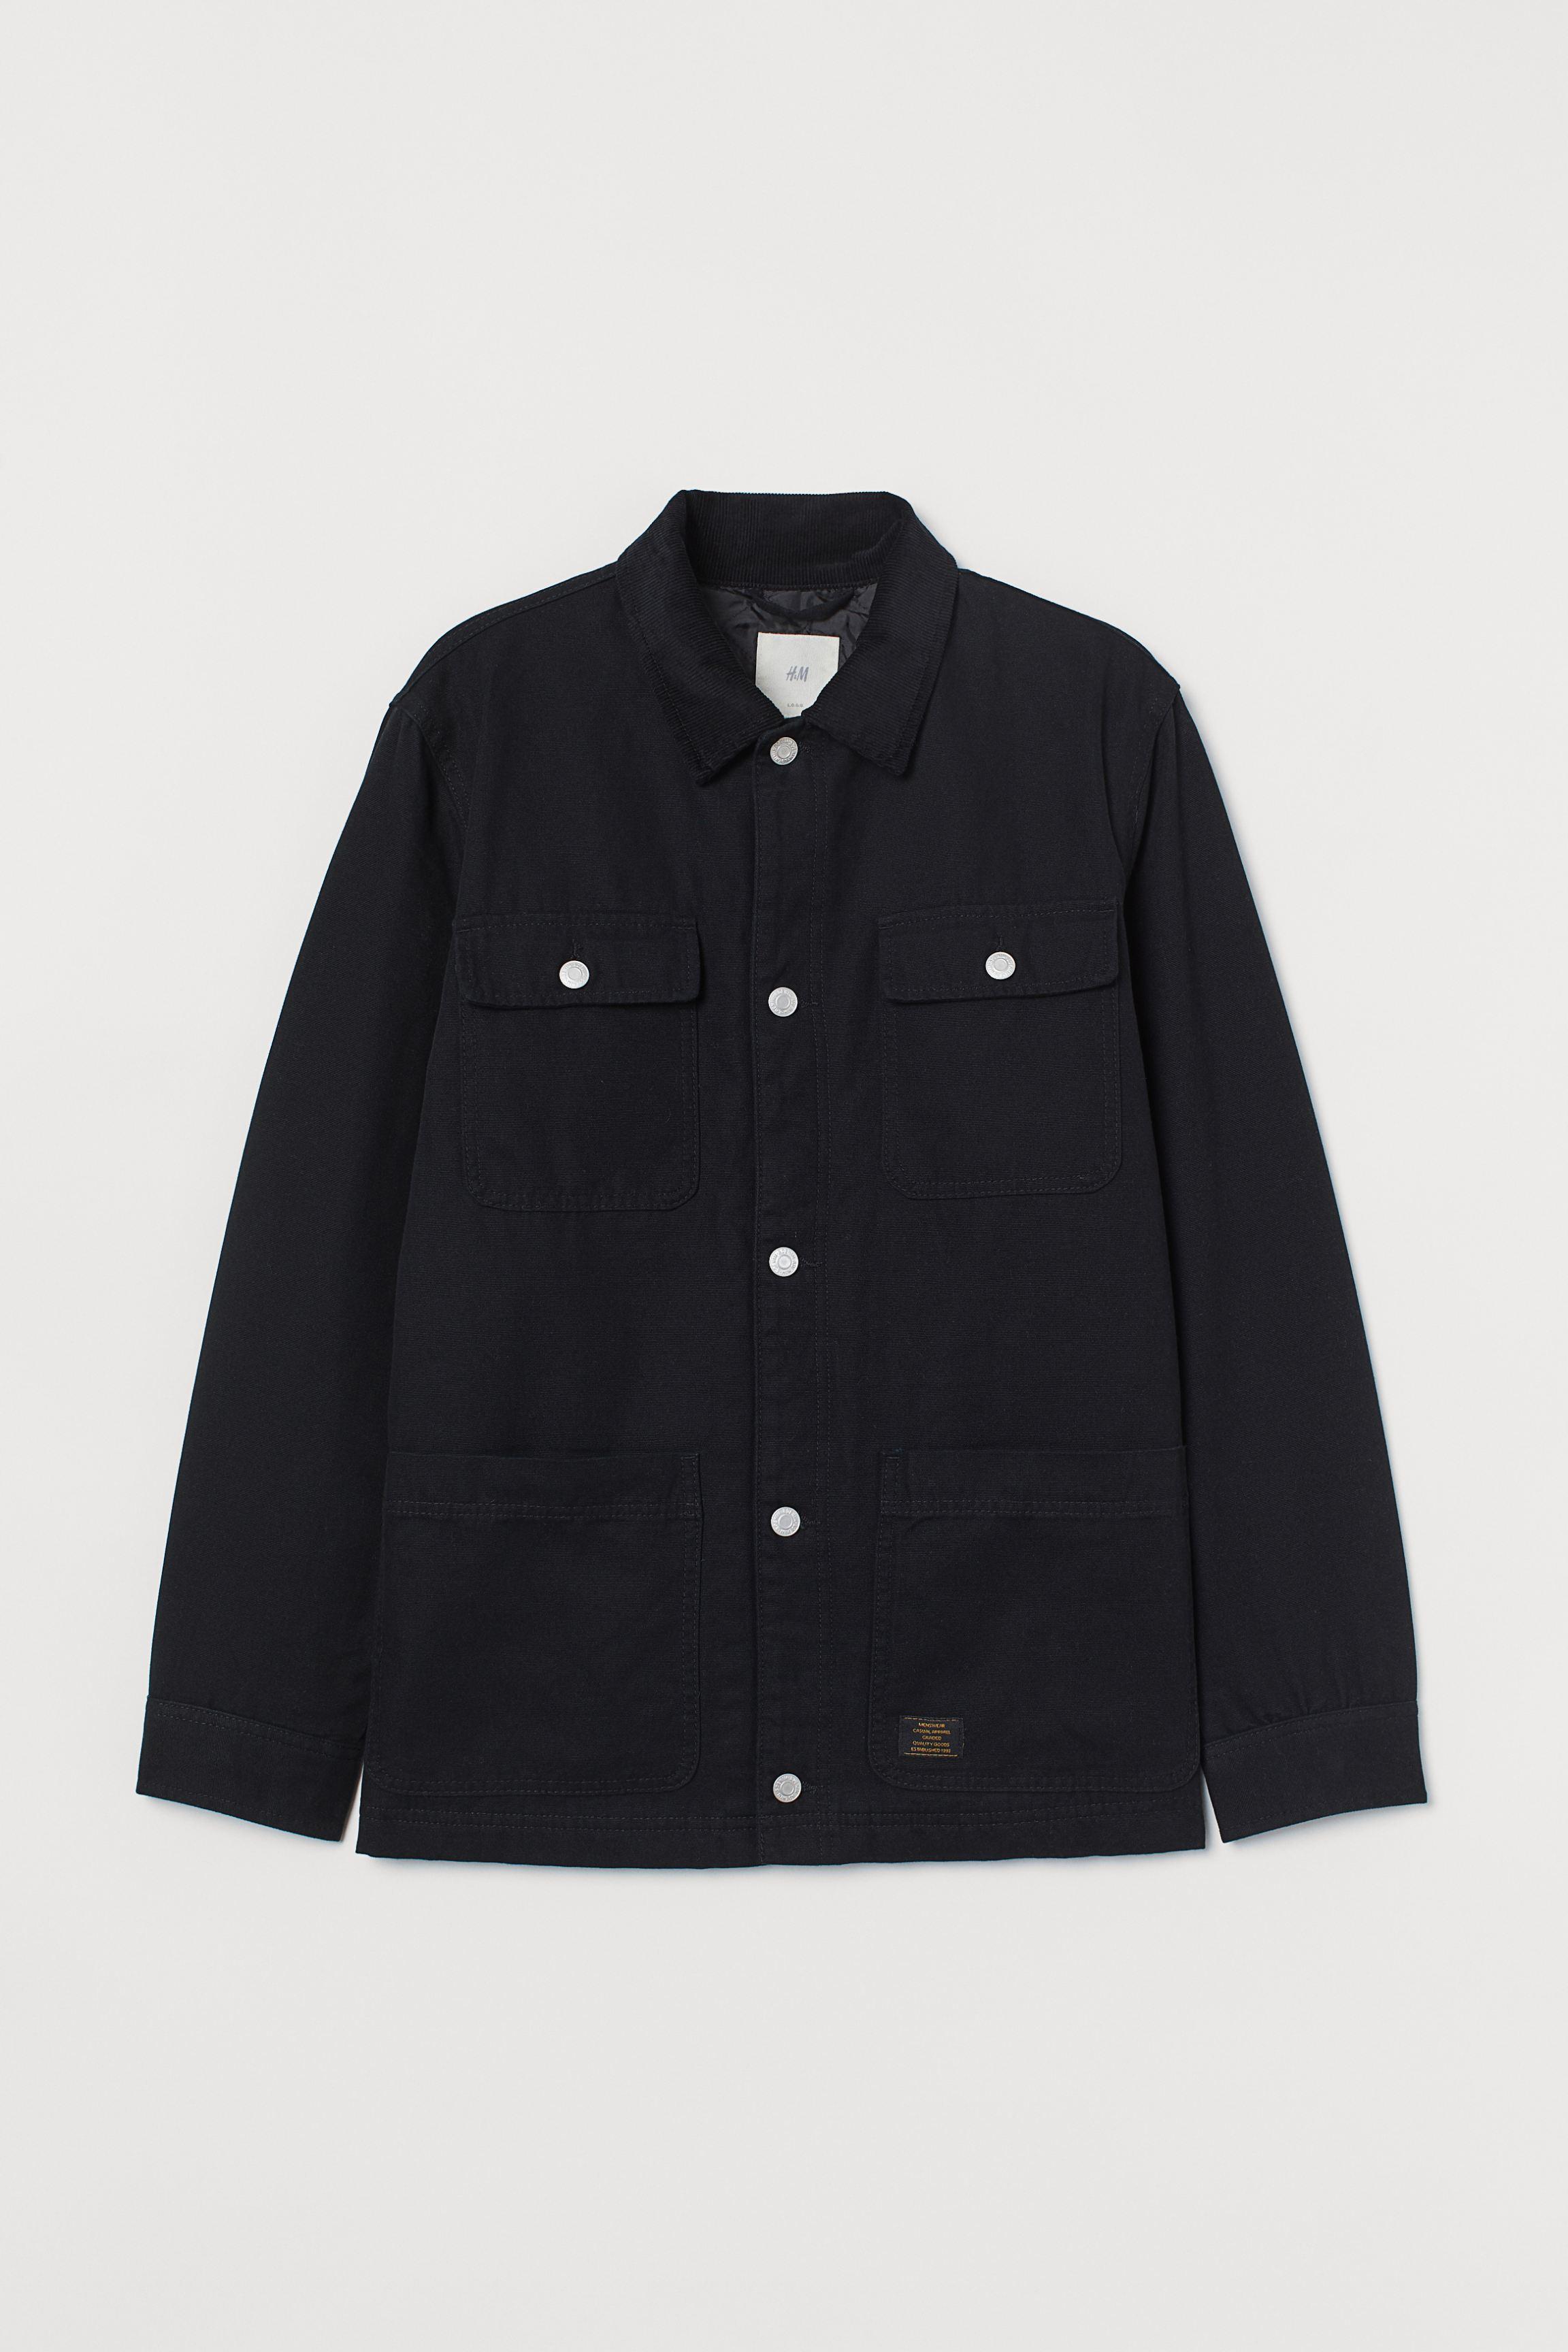 Corduroy Collared Jacket